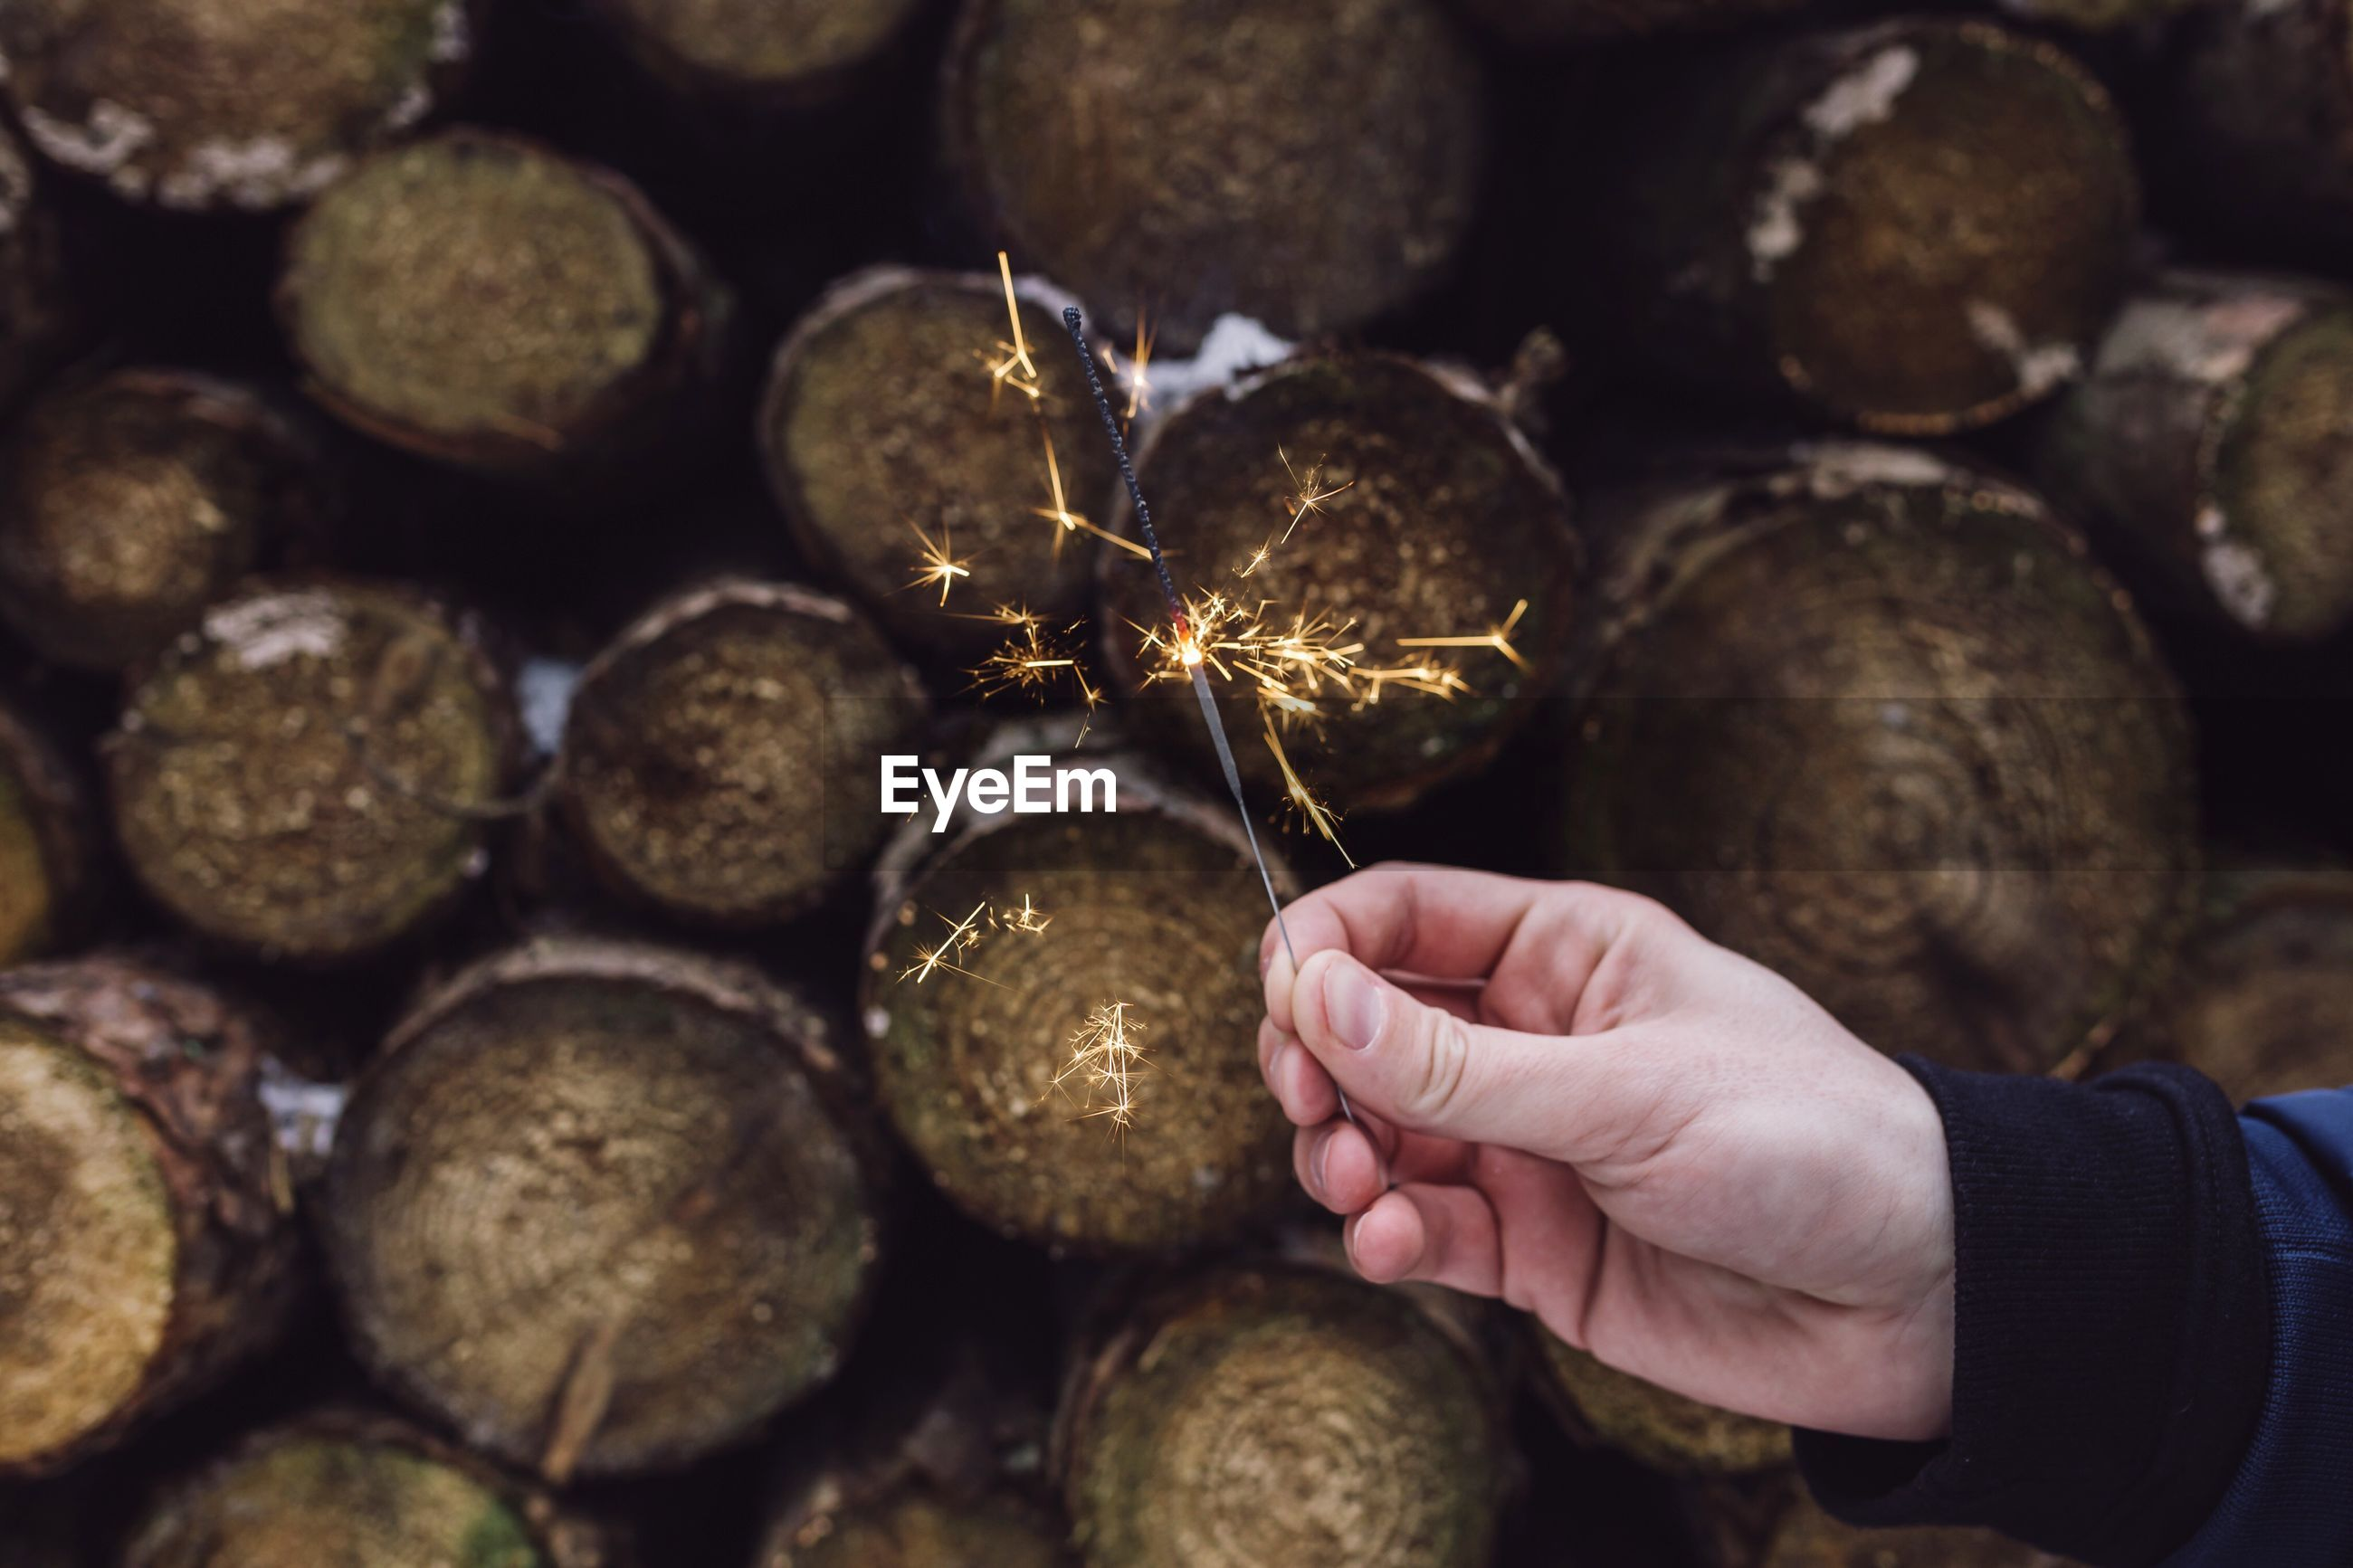 Close-up of hand holding sparkler